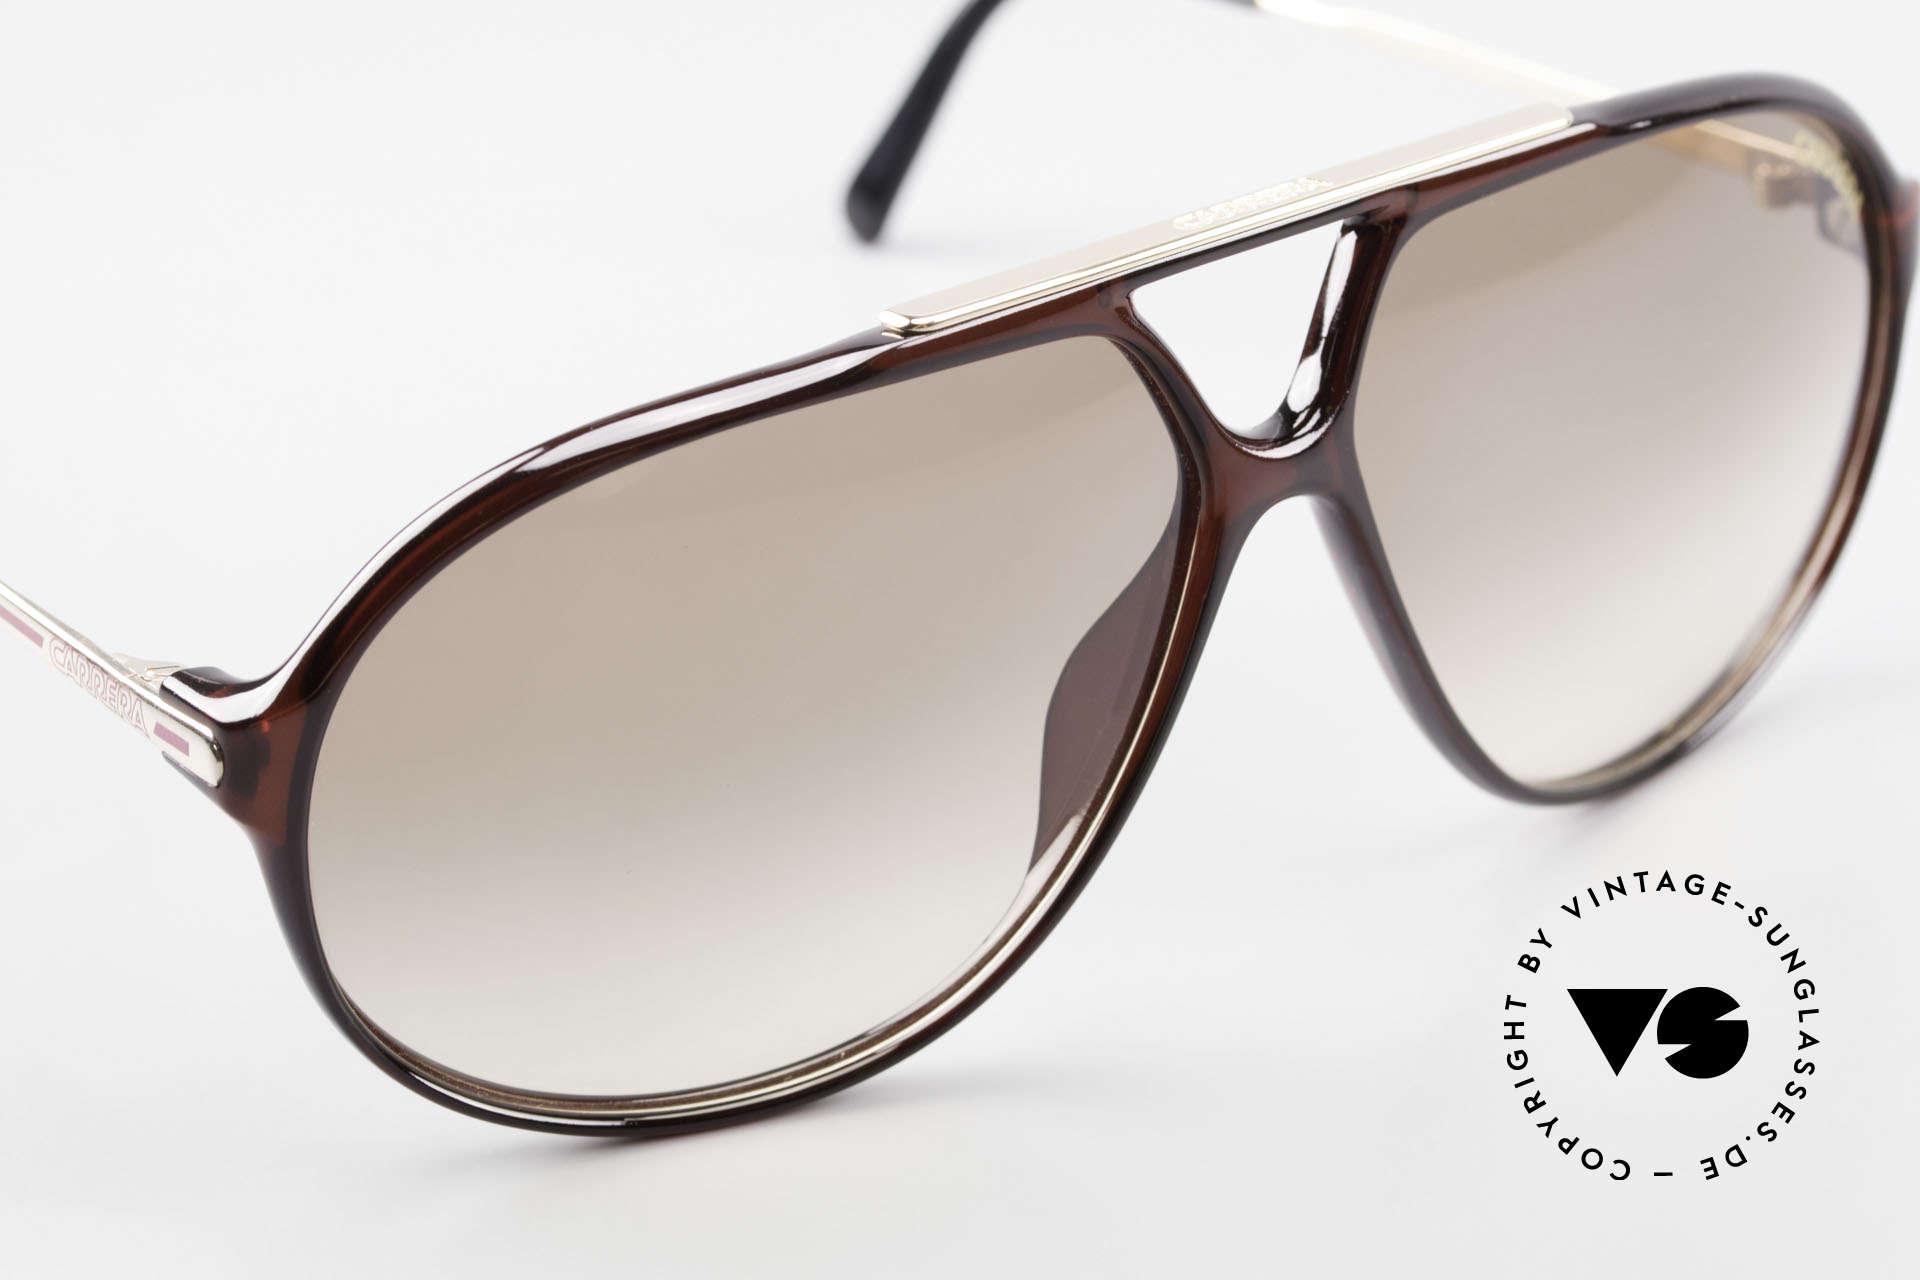 Carrera 5405 Old 90's Aviator Sunglasses, unworn rarity (like all our 80's CARRERA sunglasses), Made for Men